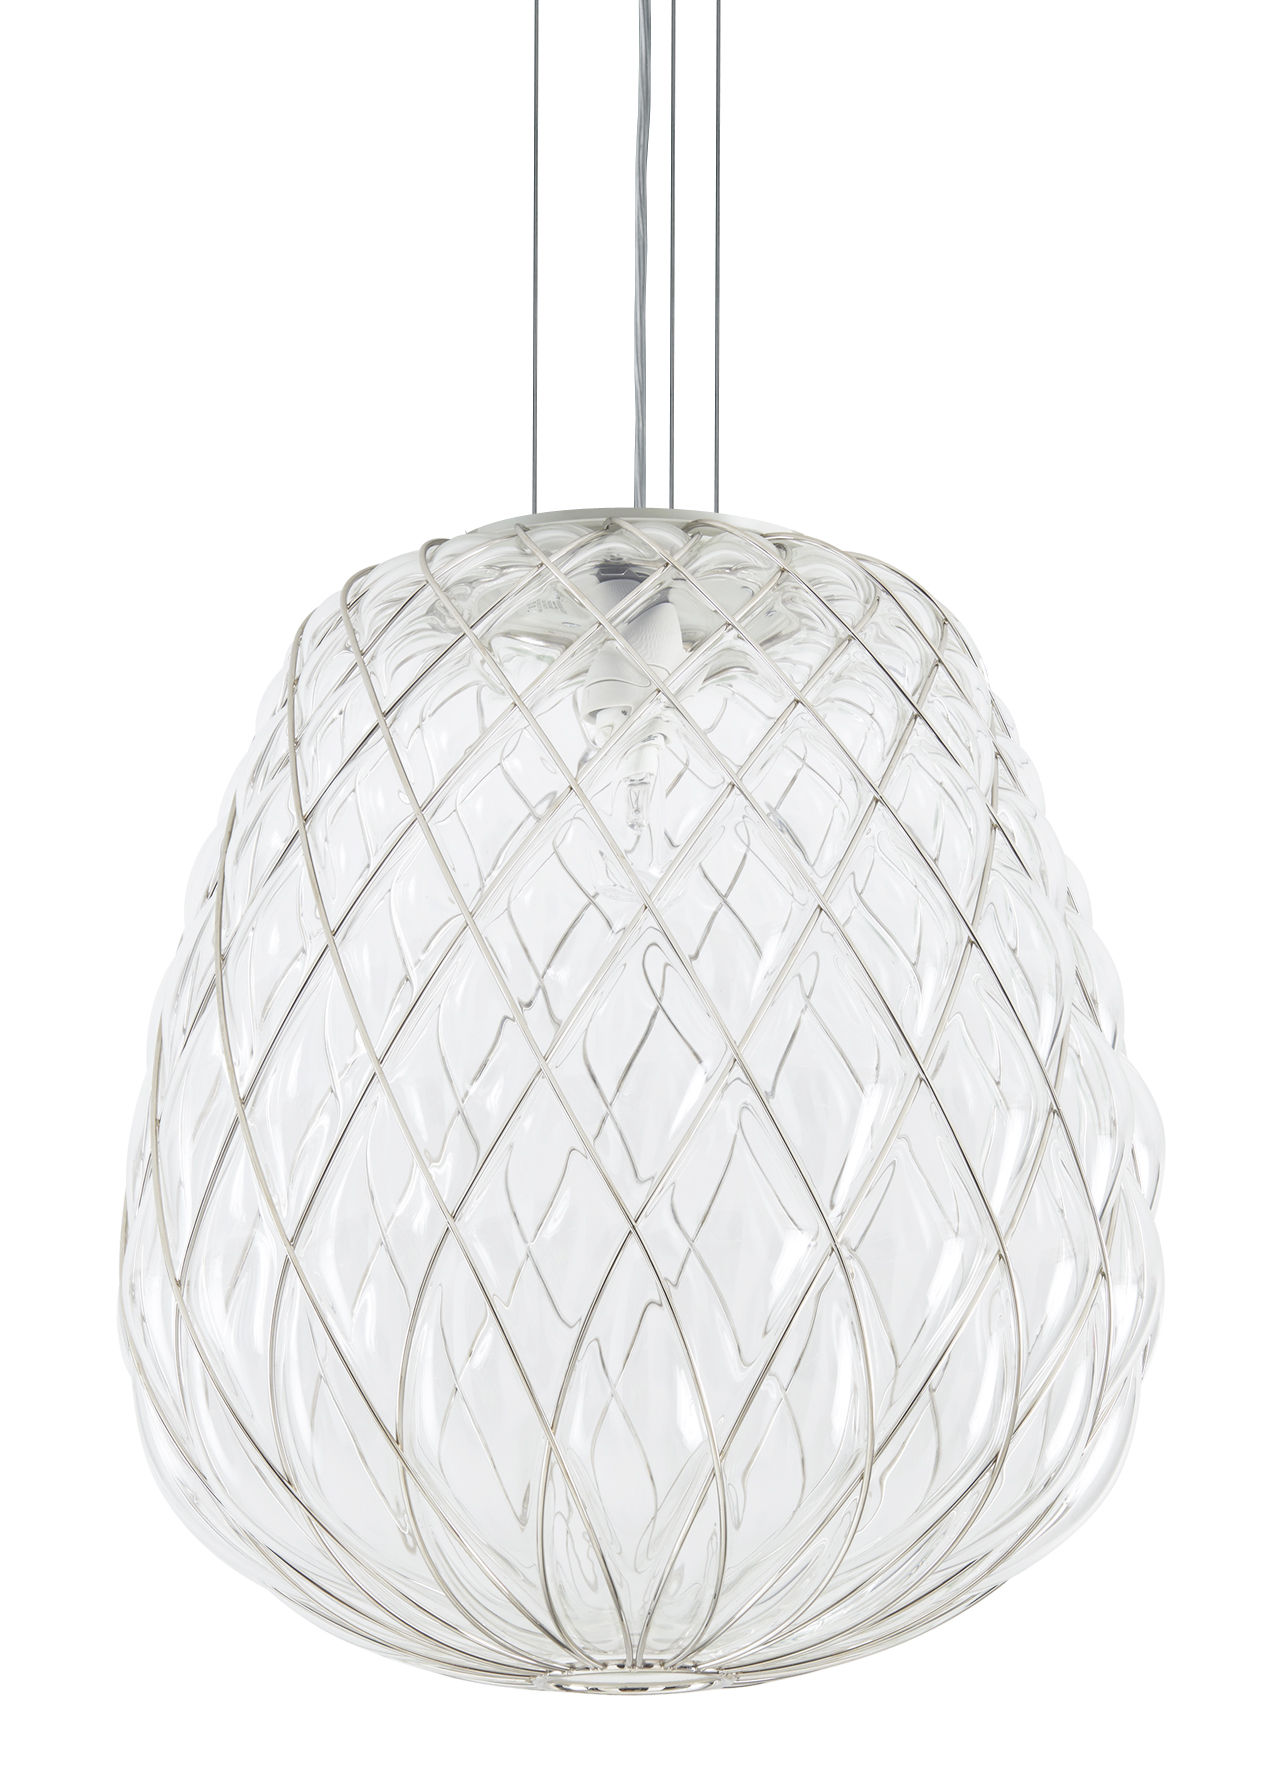 Illuminazione - Lampadari - Sospensione Pinecone / Ø 50 x H 50 cm - Vetro & rete metallica - Fontana Arte - Trasparente / Rete metallica - Metallo, Vetro soffiato a bocca